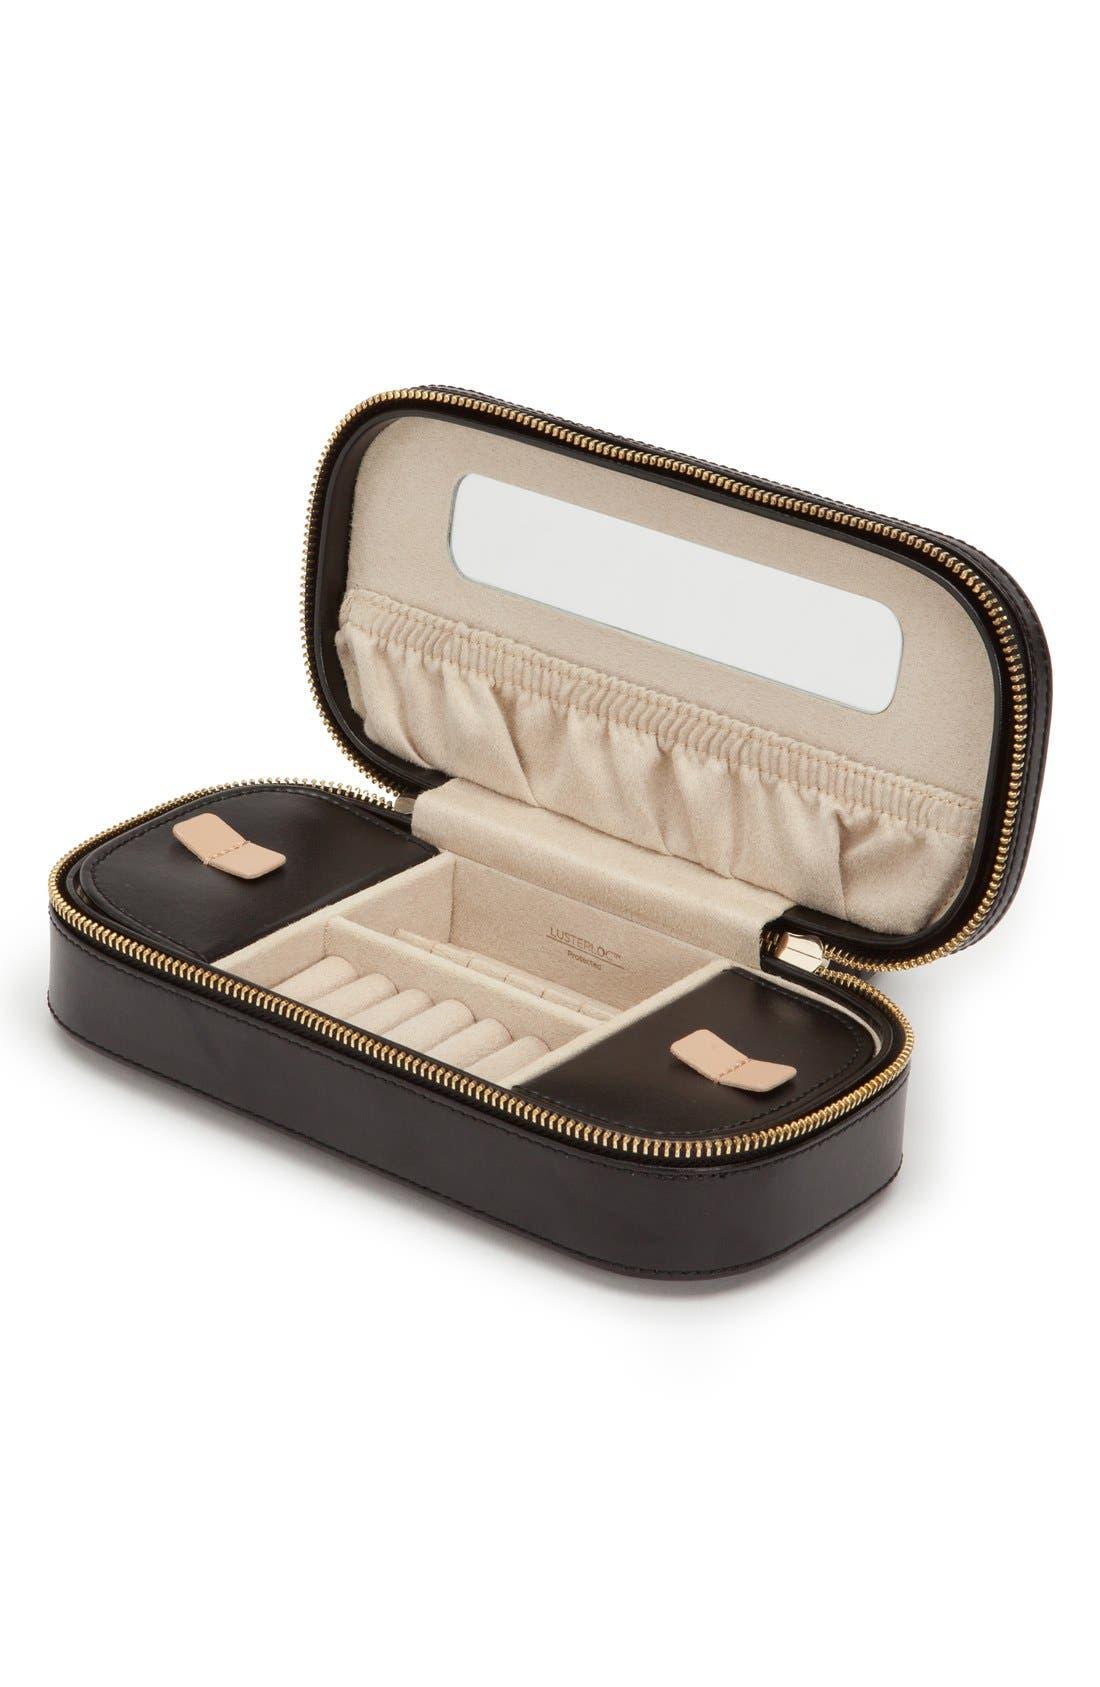 'Chloe' Zip Jewelry Case, Main, color, BLACK